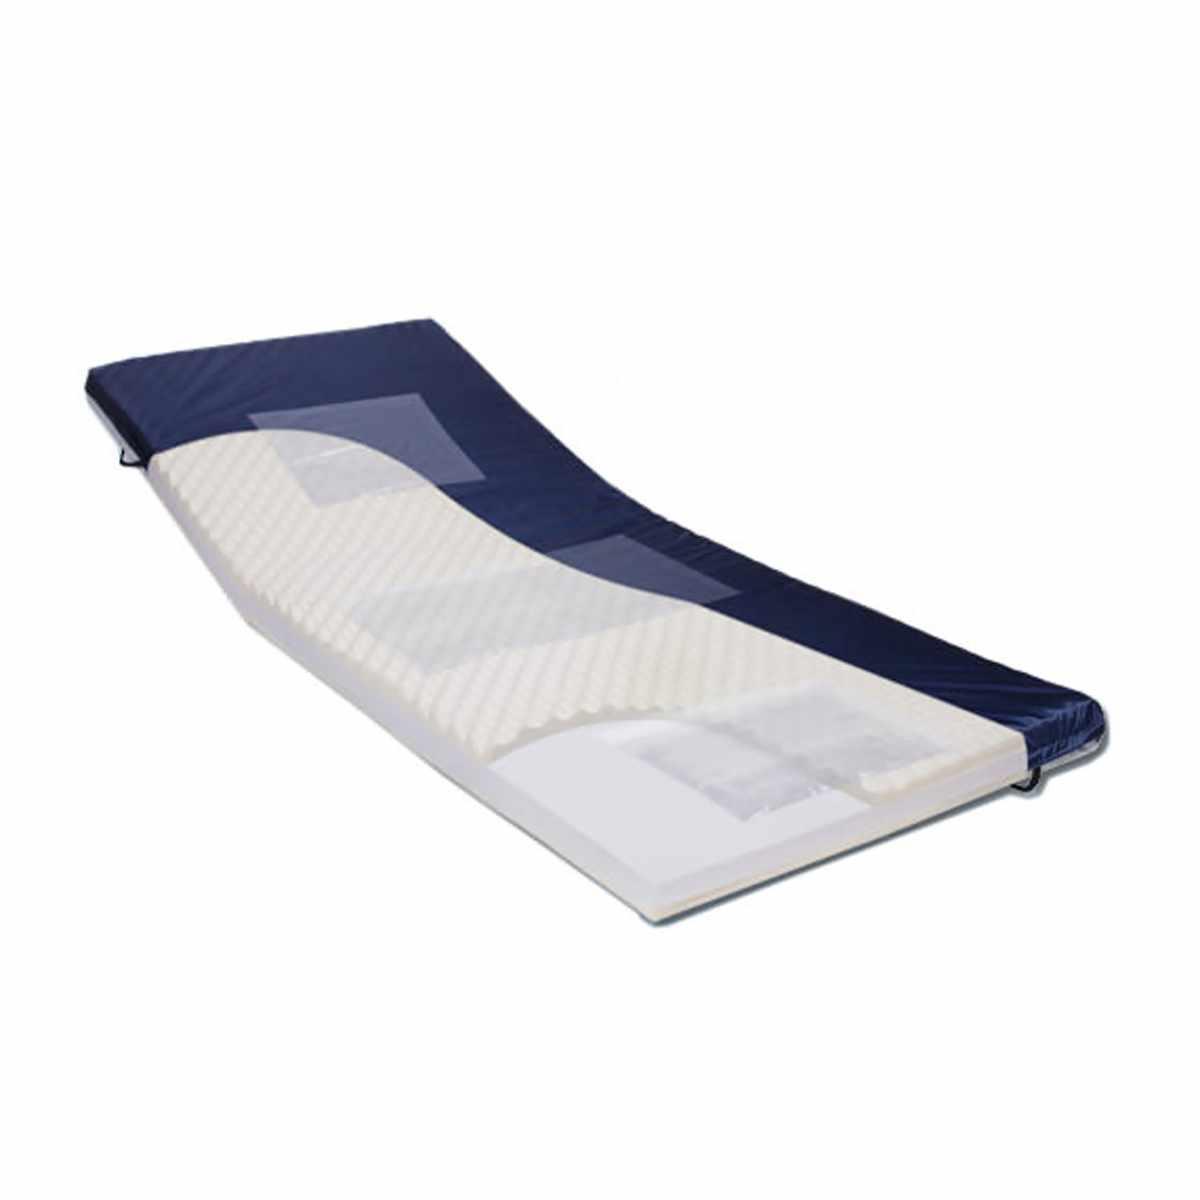 Span America Gel 80™ gel/foam mattress overlay